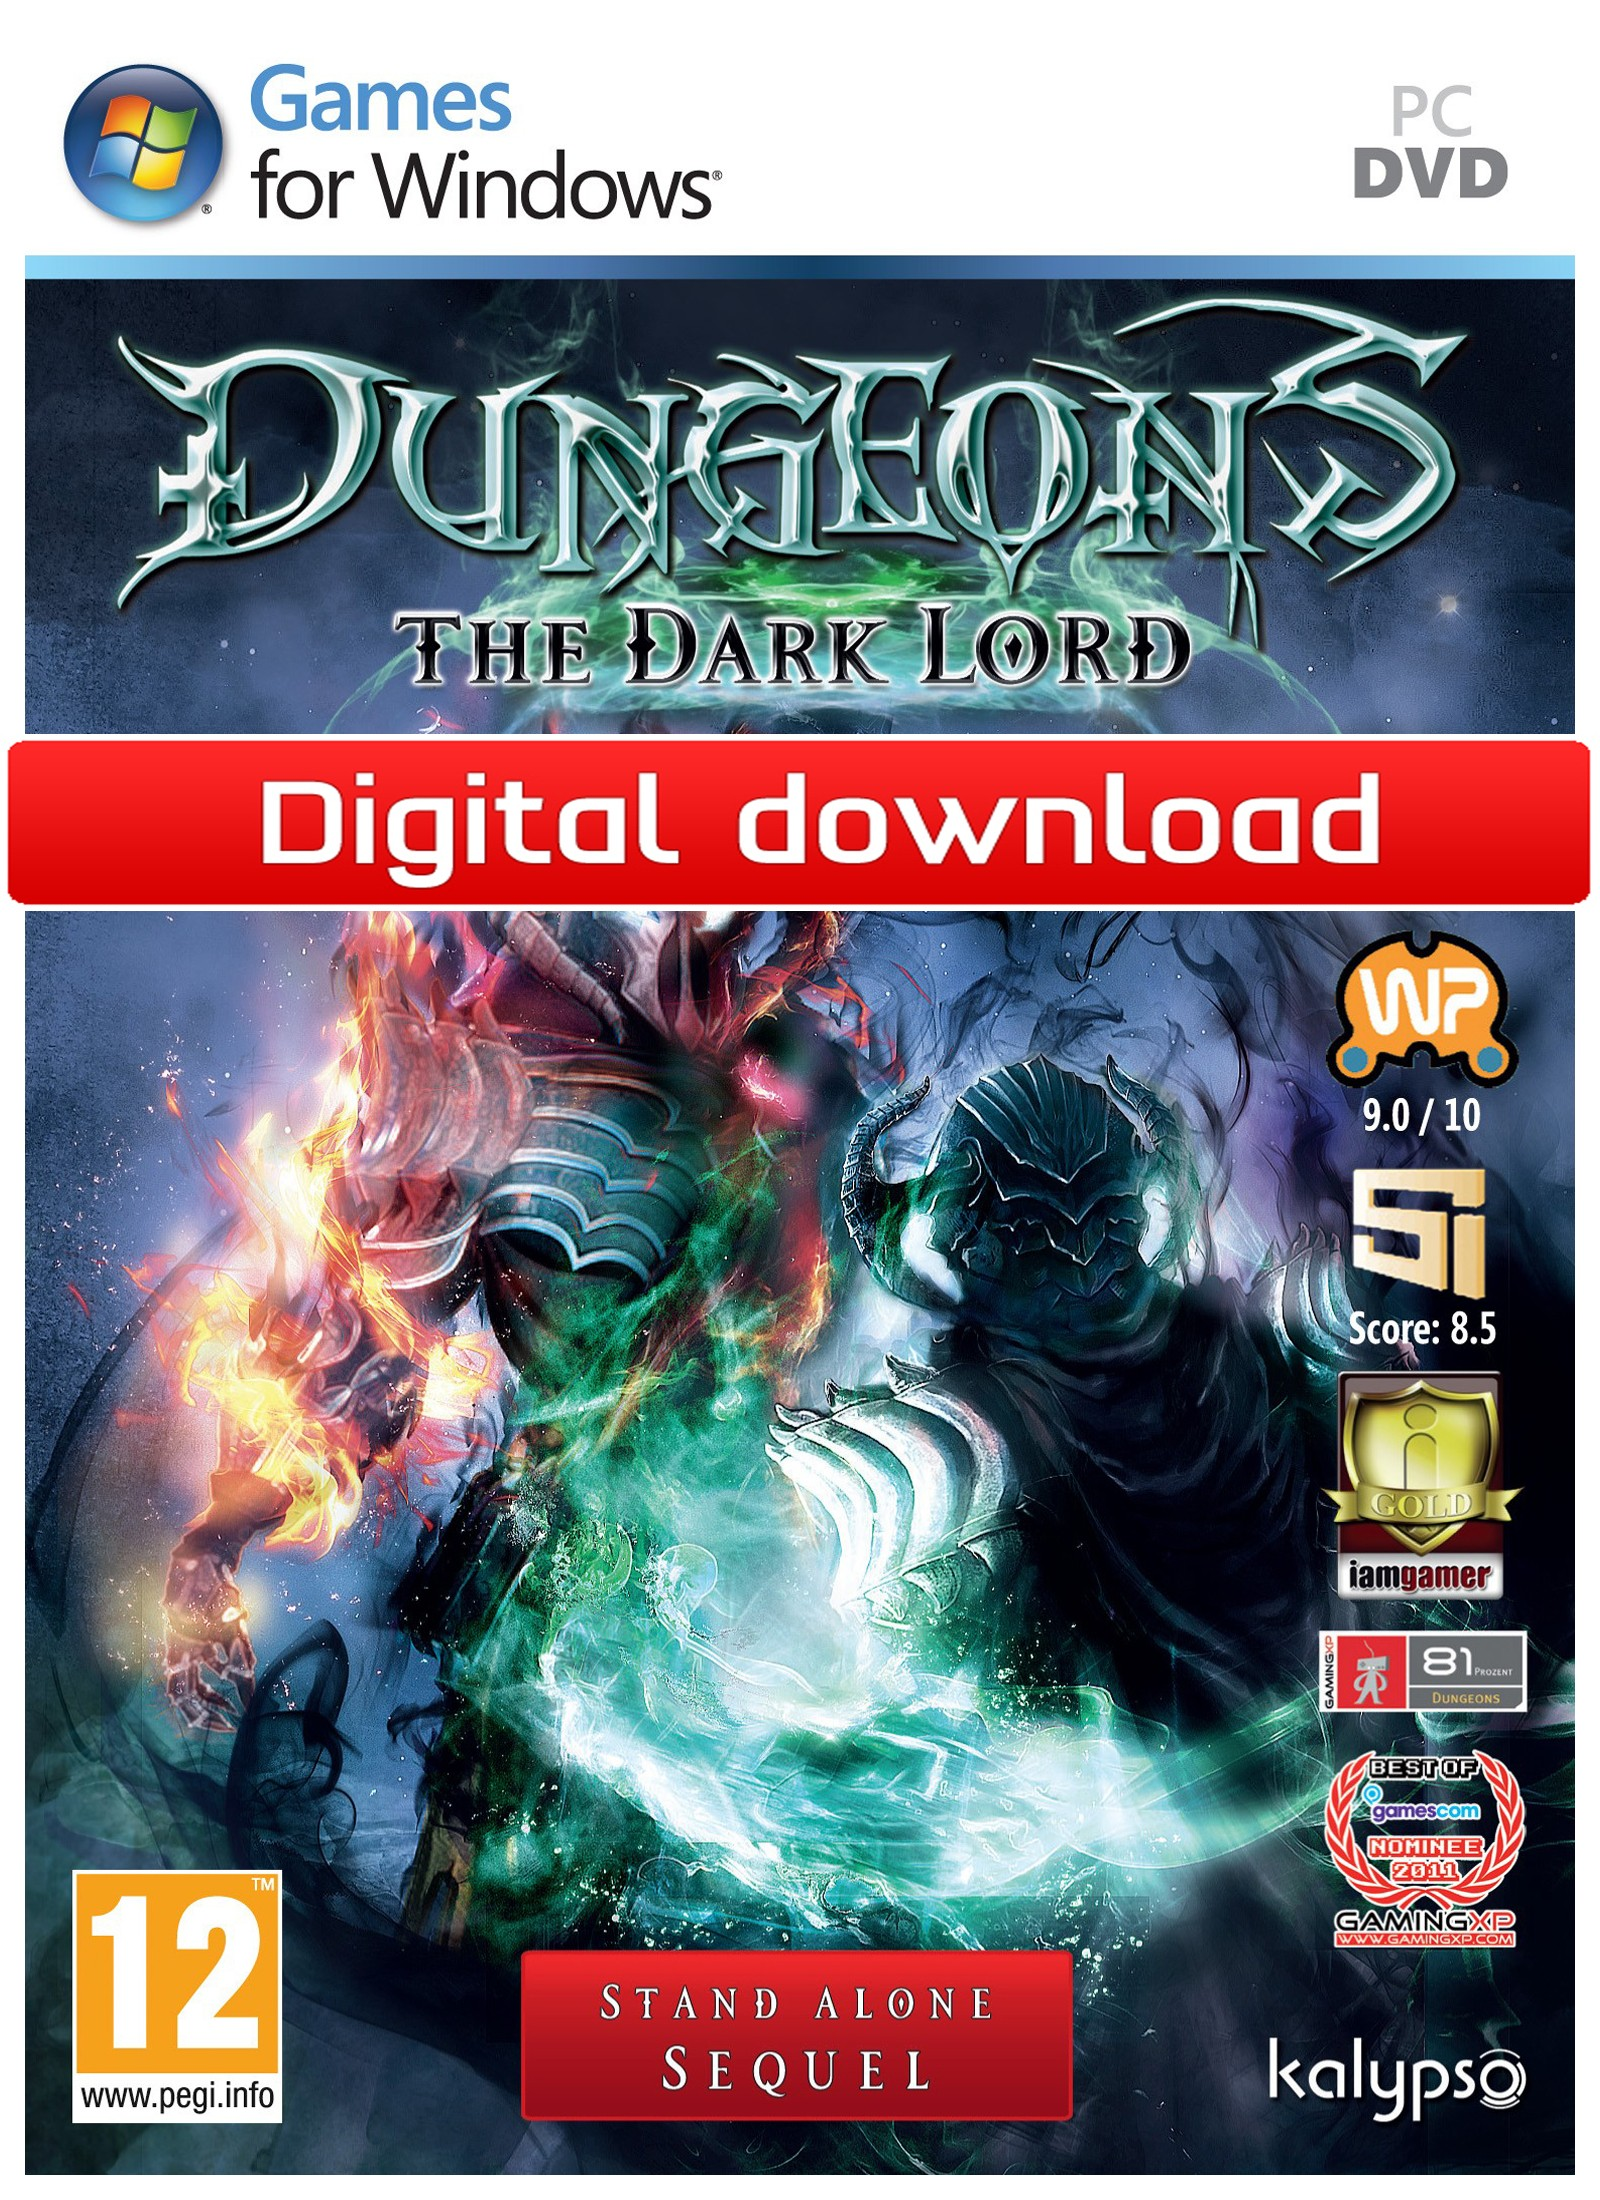 Dungeons: The Dark Lord (PC nedlastning) PCDD27710